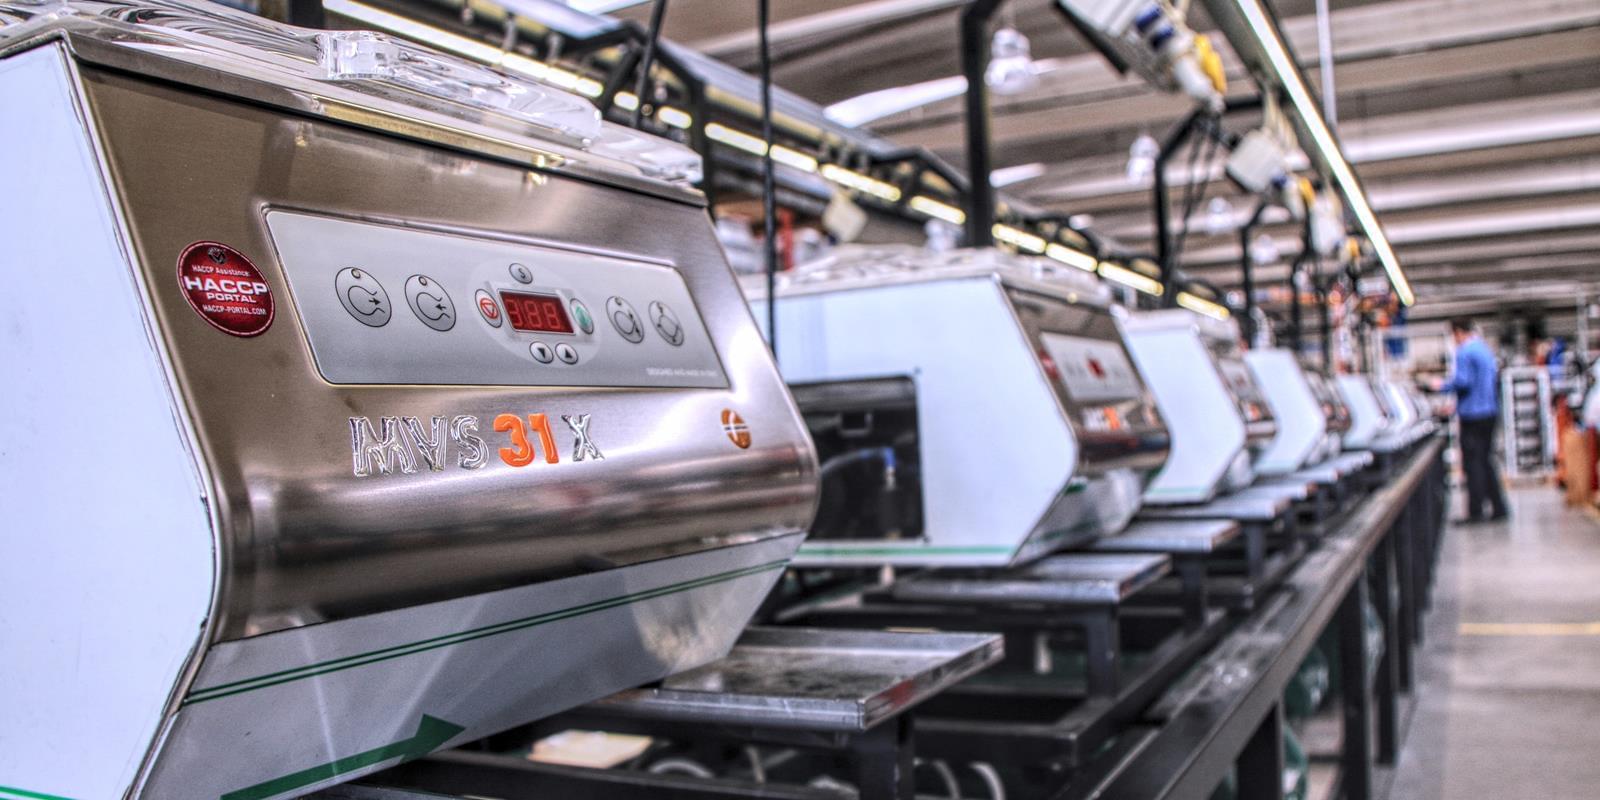 Linea macchine sottovuoto testata 1600